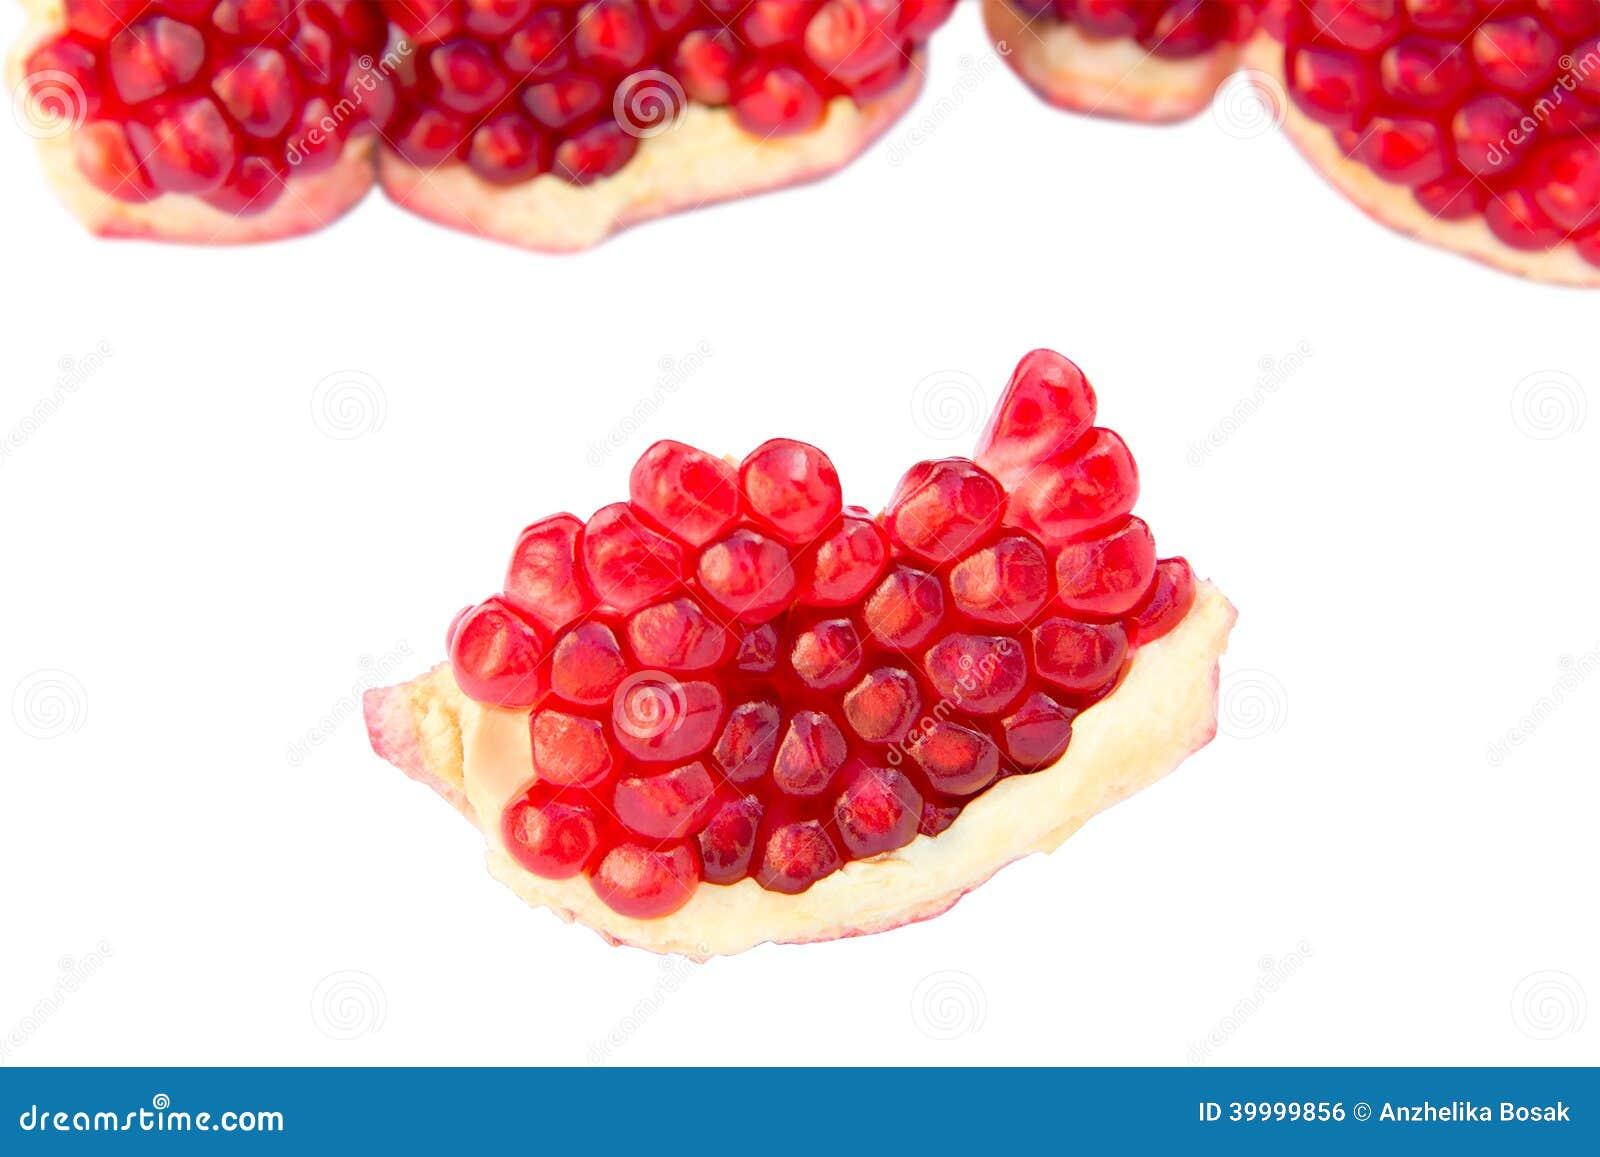 Sliced pomegranate